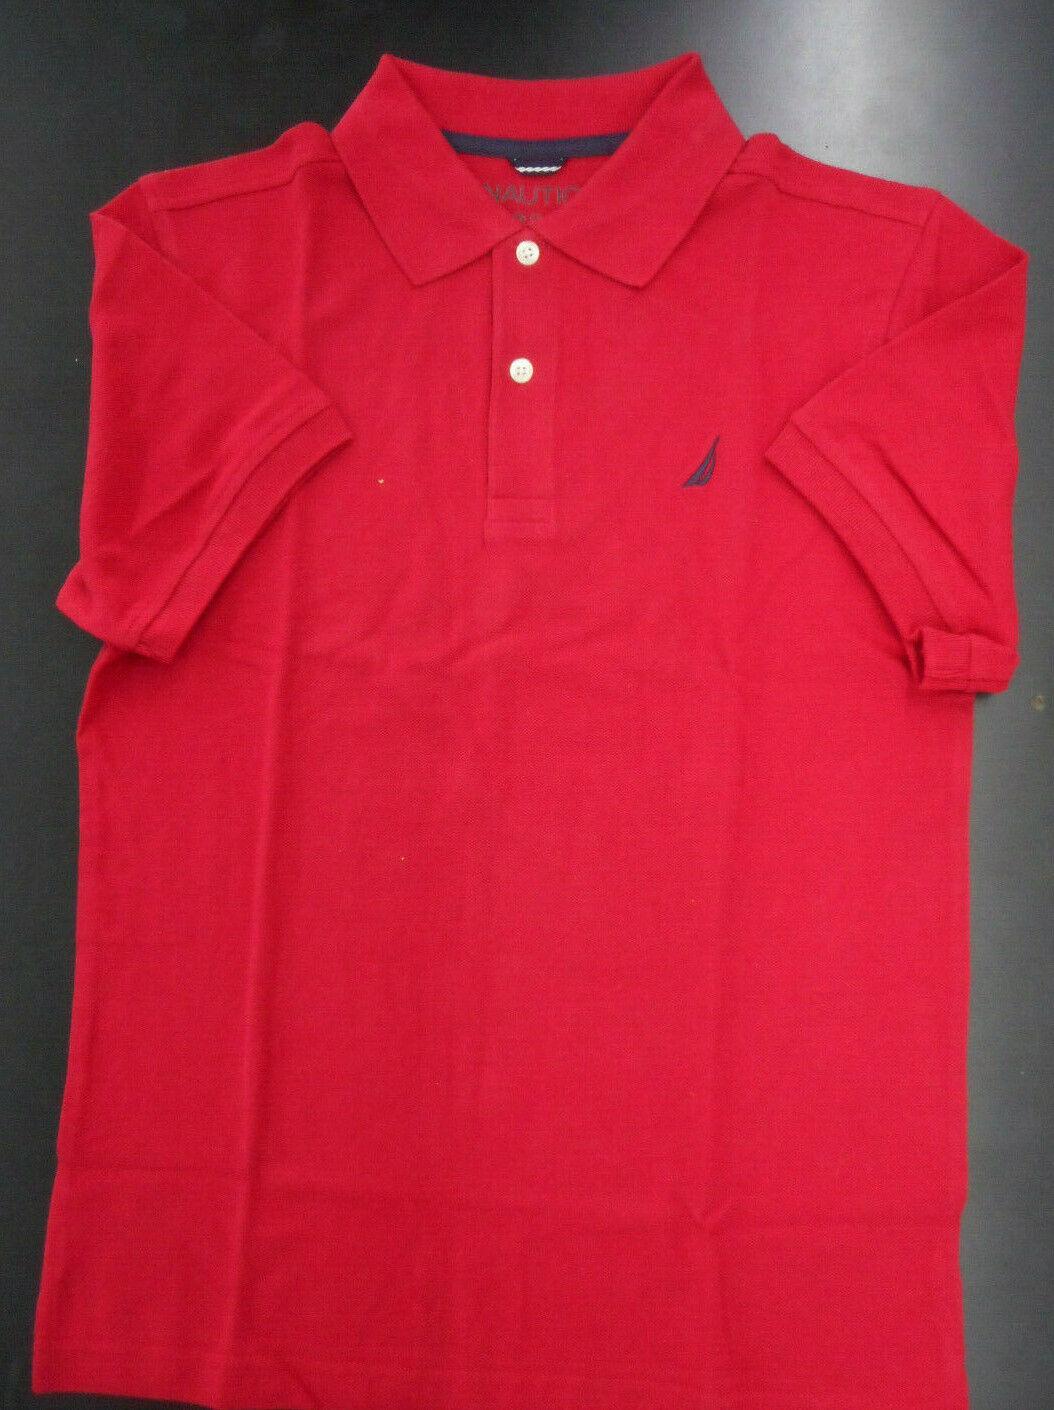 Boys Nautica $29.50 Red Short Sleeved Polo Shirt Size 14-16